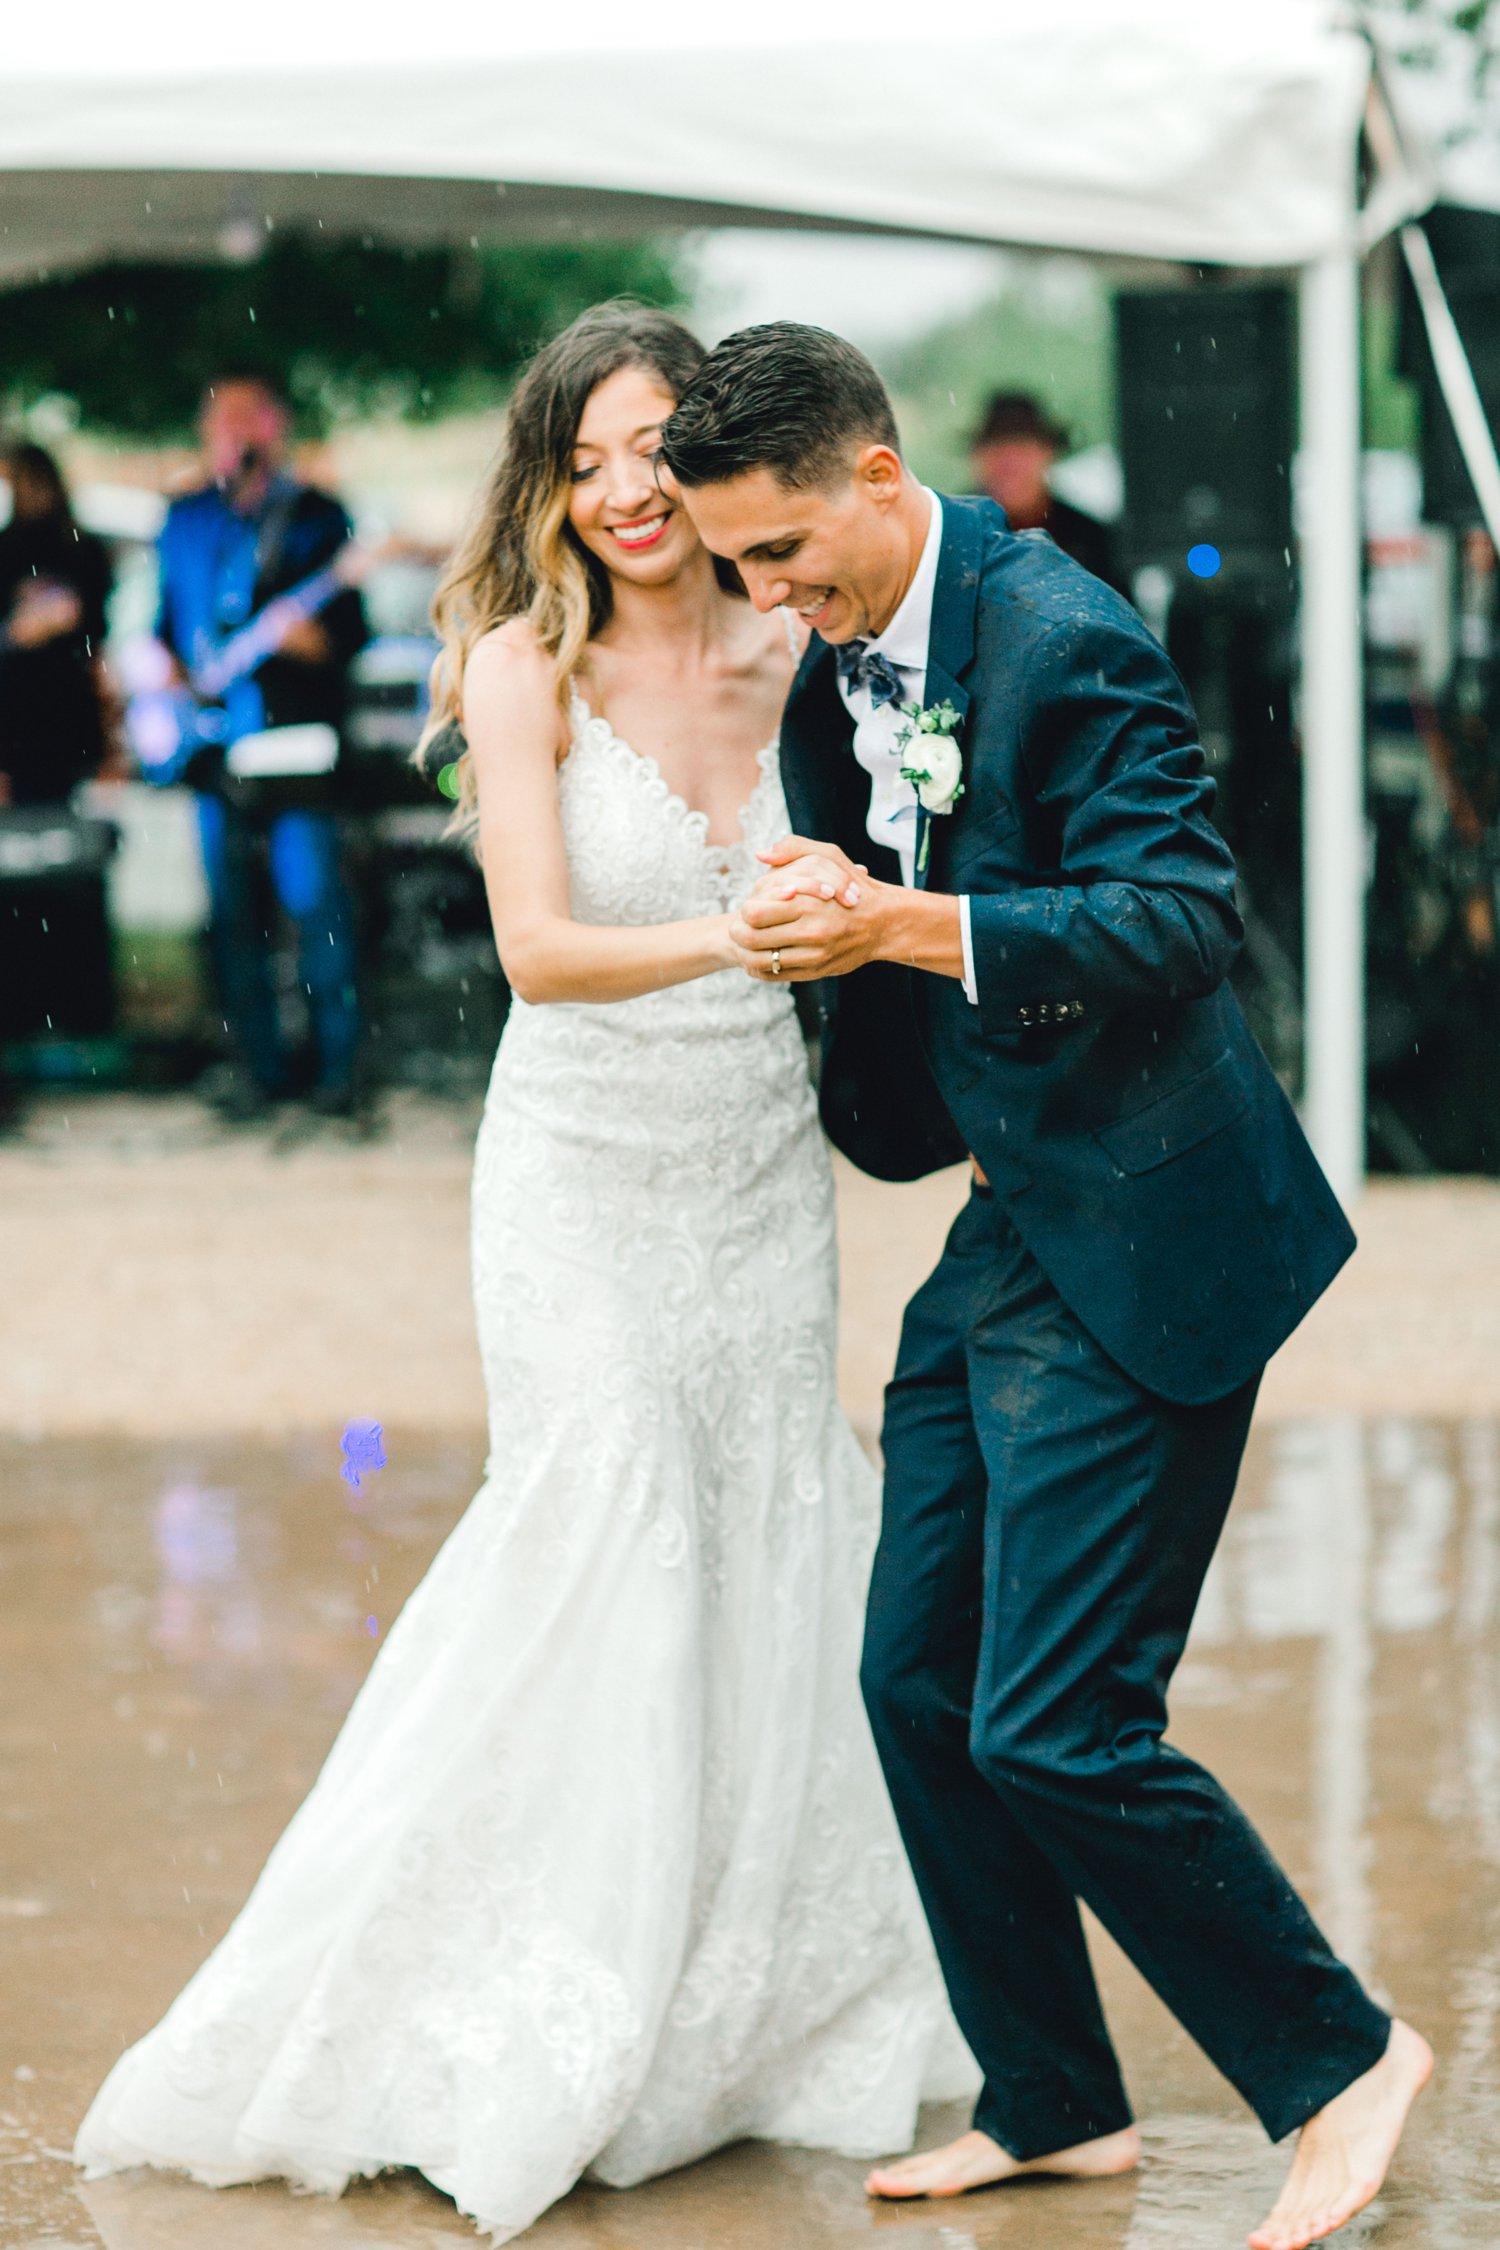 Ashley_John_English_Elegant_Texas_Wedding_Outdoors_Ranch_Caprock_Winery_ALLEEJ_0165.jpg